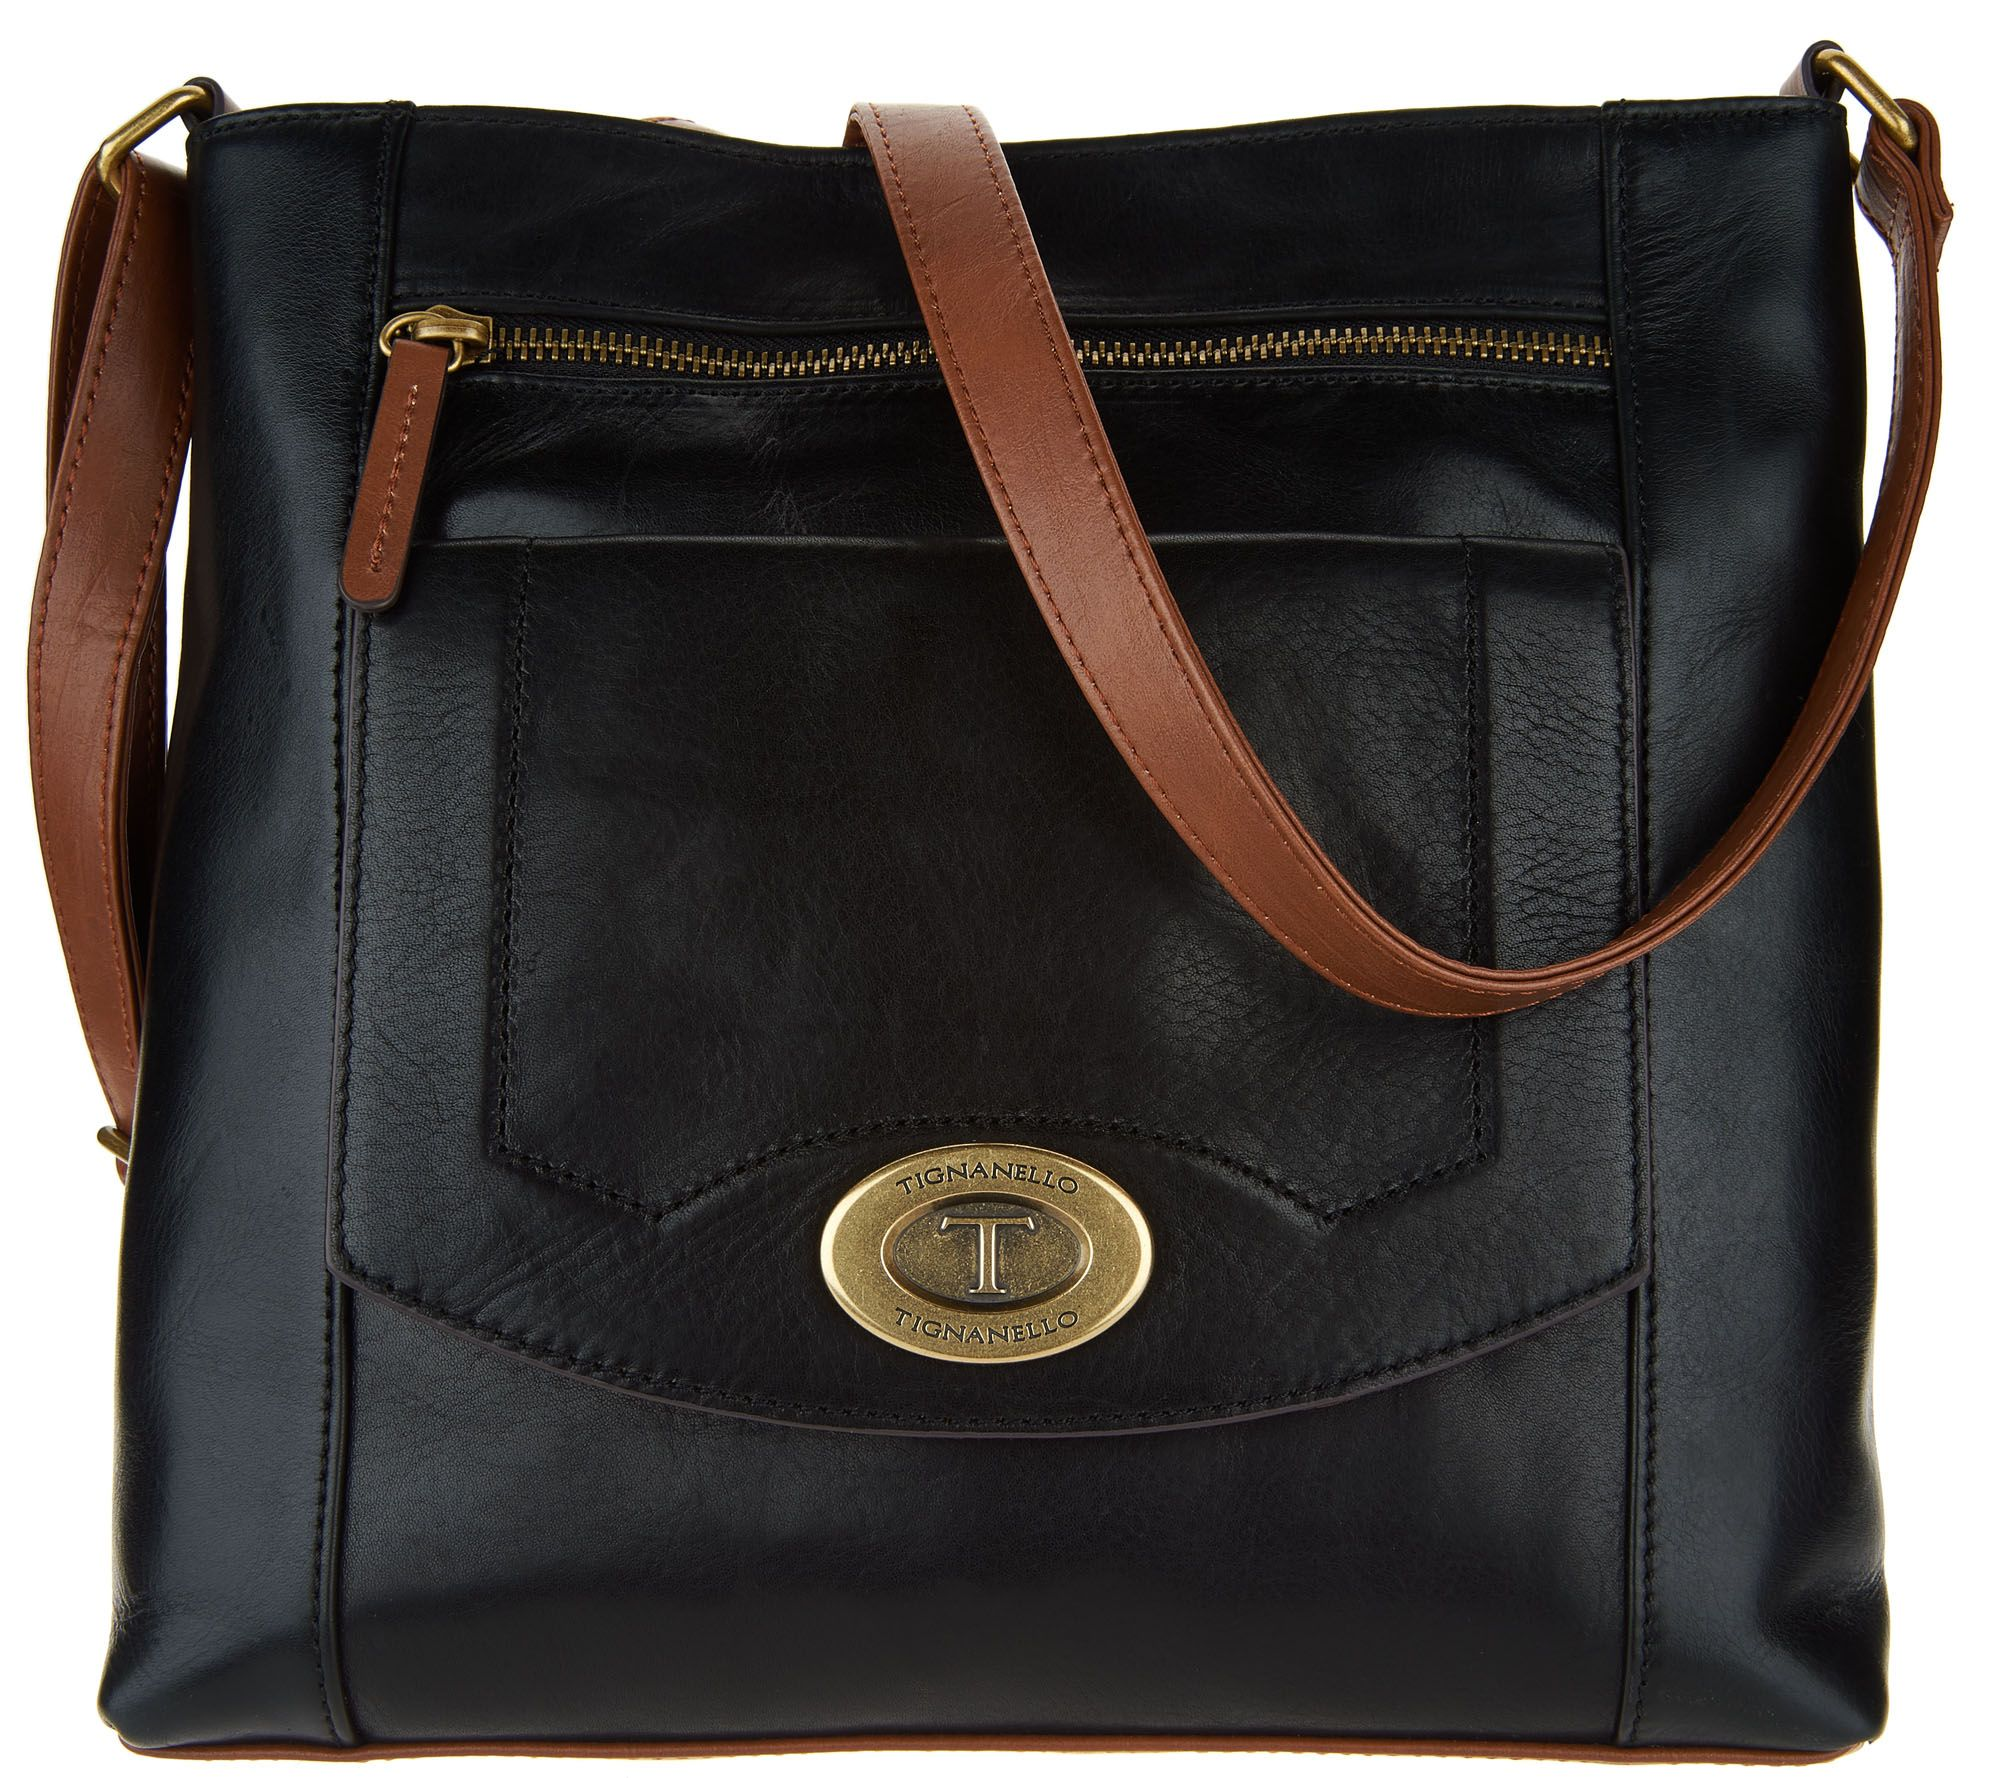 Qvc Clearance Handbags Tignanello